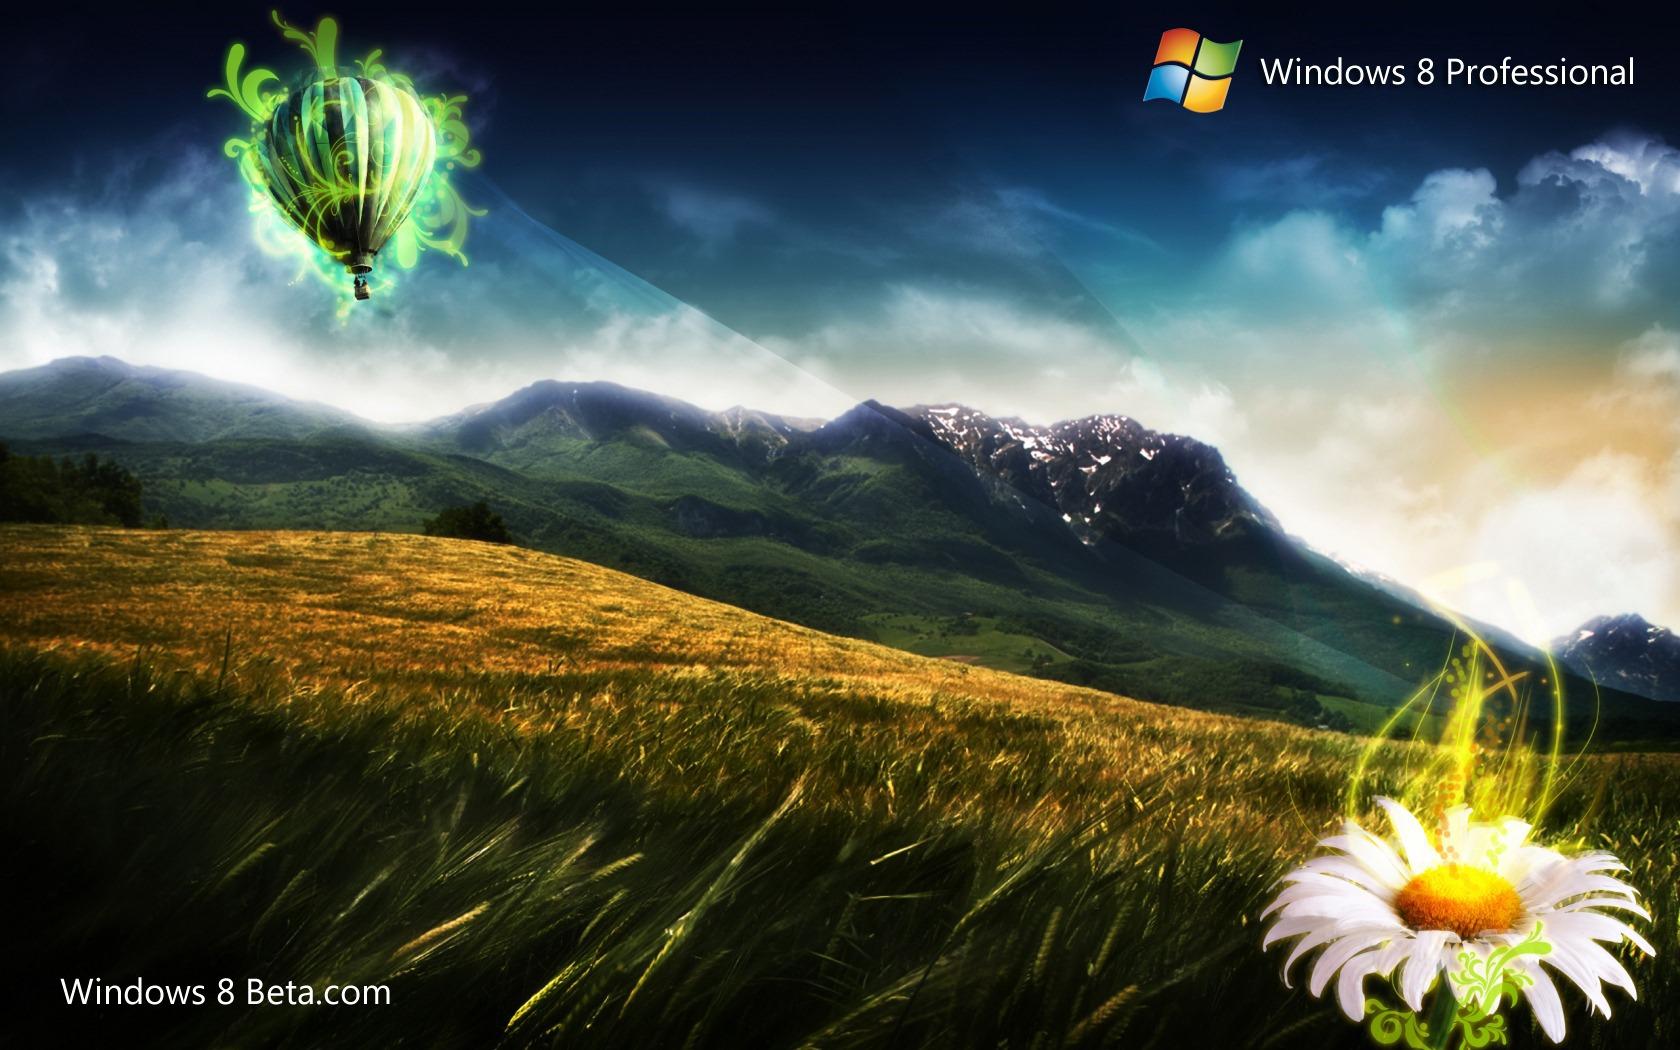 http://2.bp.blogspot.com/-VXOT92nrPiM/UKUQeDd92MI/AAAAAAAAC4w/JTOs9eTm3v0/s4000/Windows+8+Wallpaper+HD+2.jpg